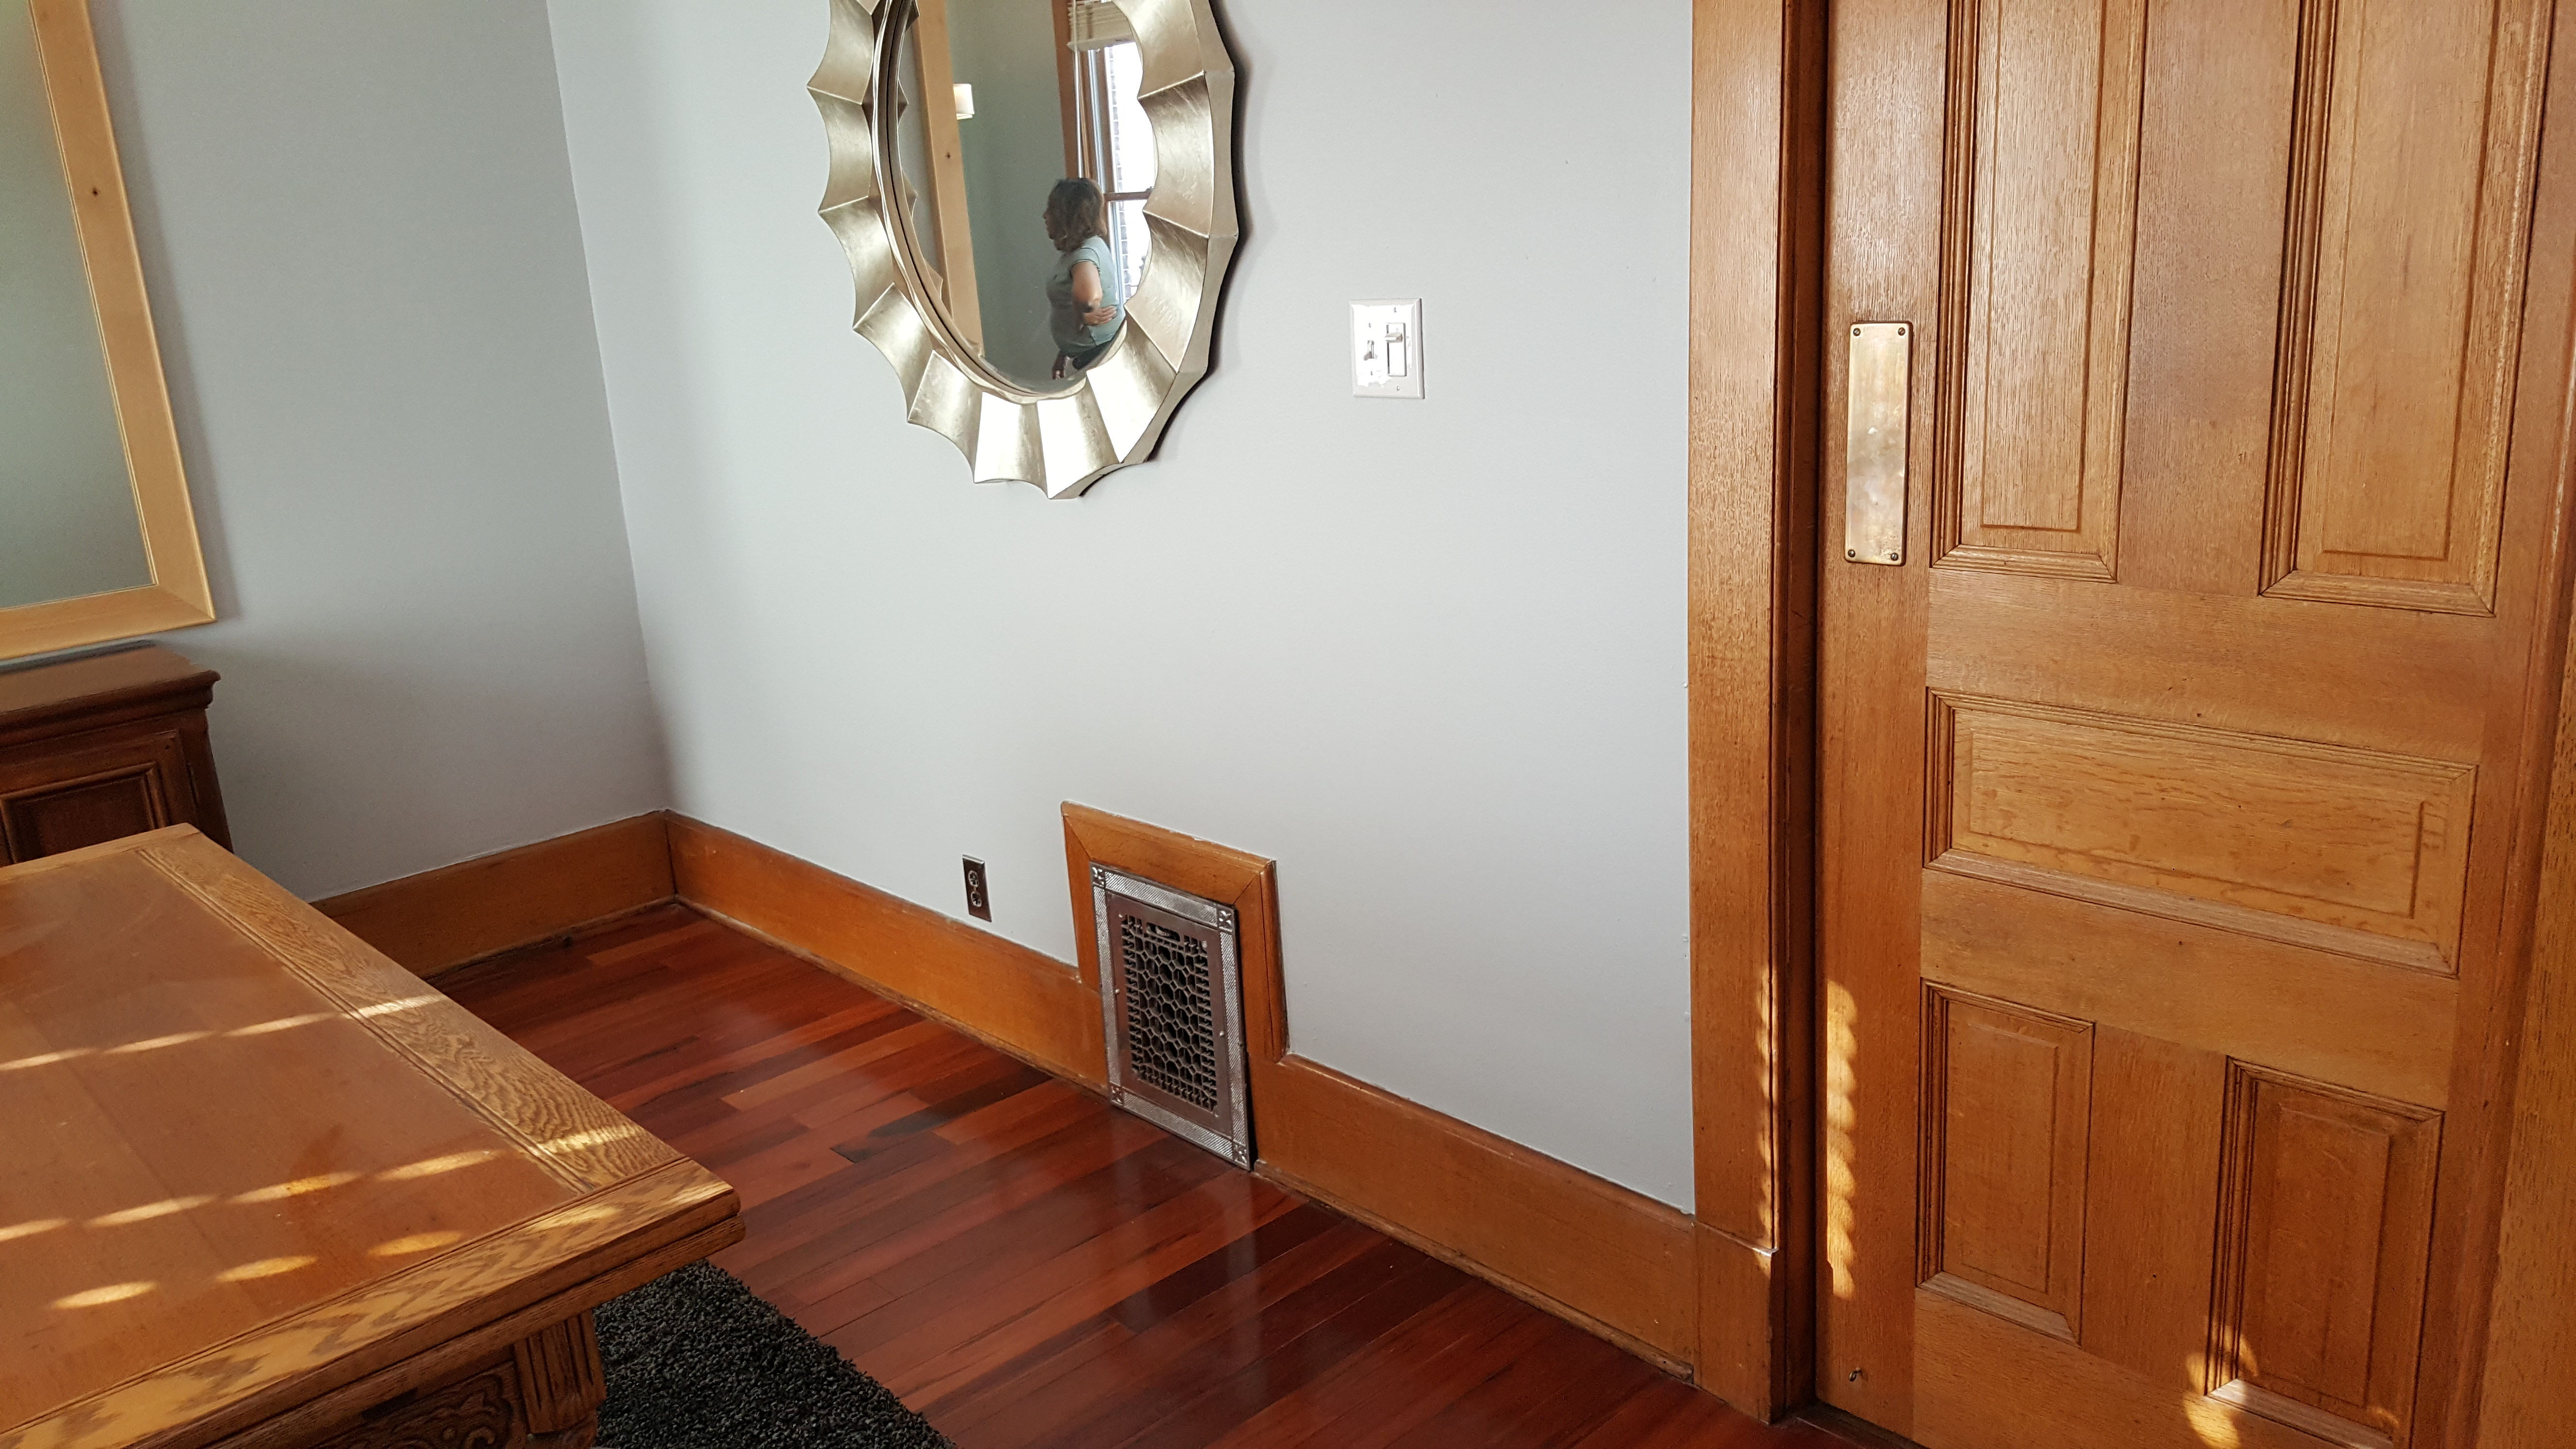 Accolade Drywall LLC image 3